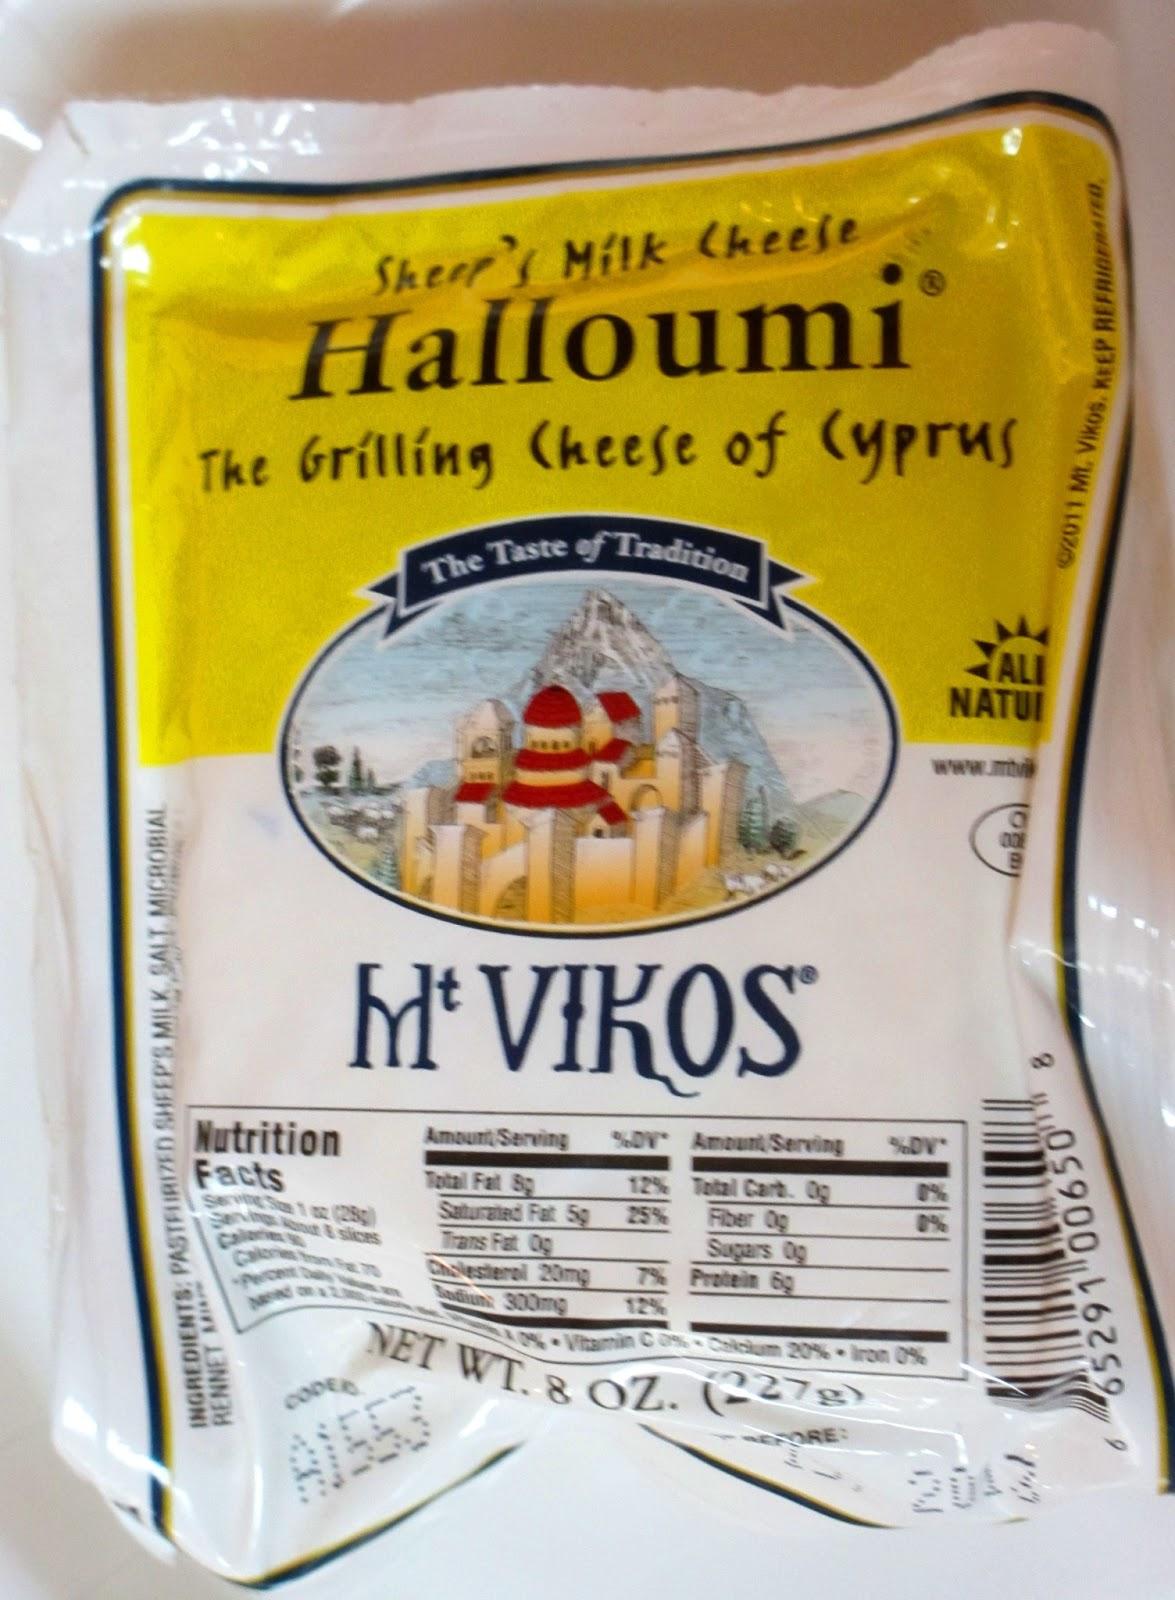 how to keep halloumi cheese